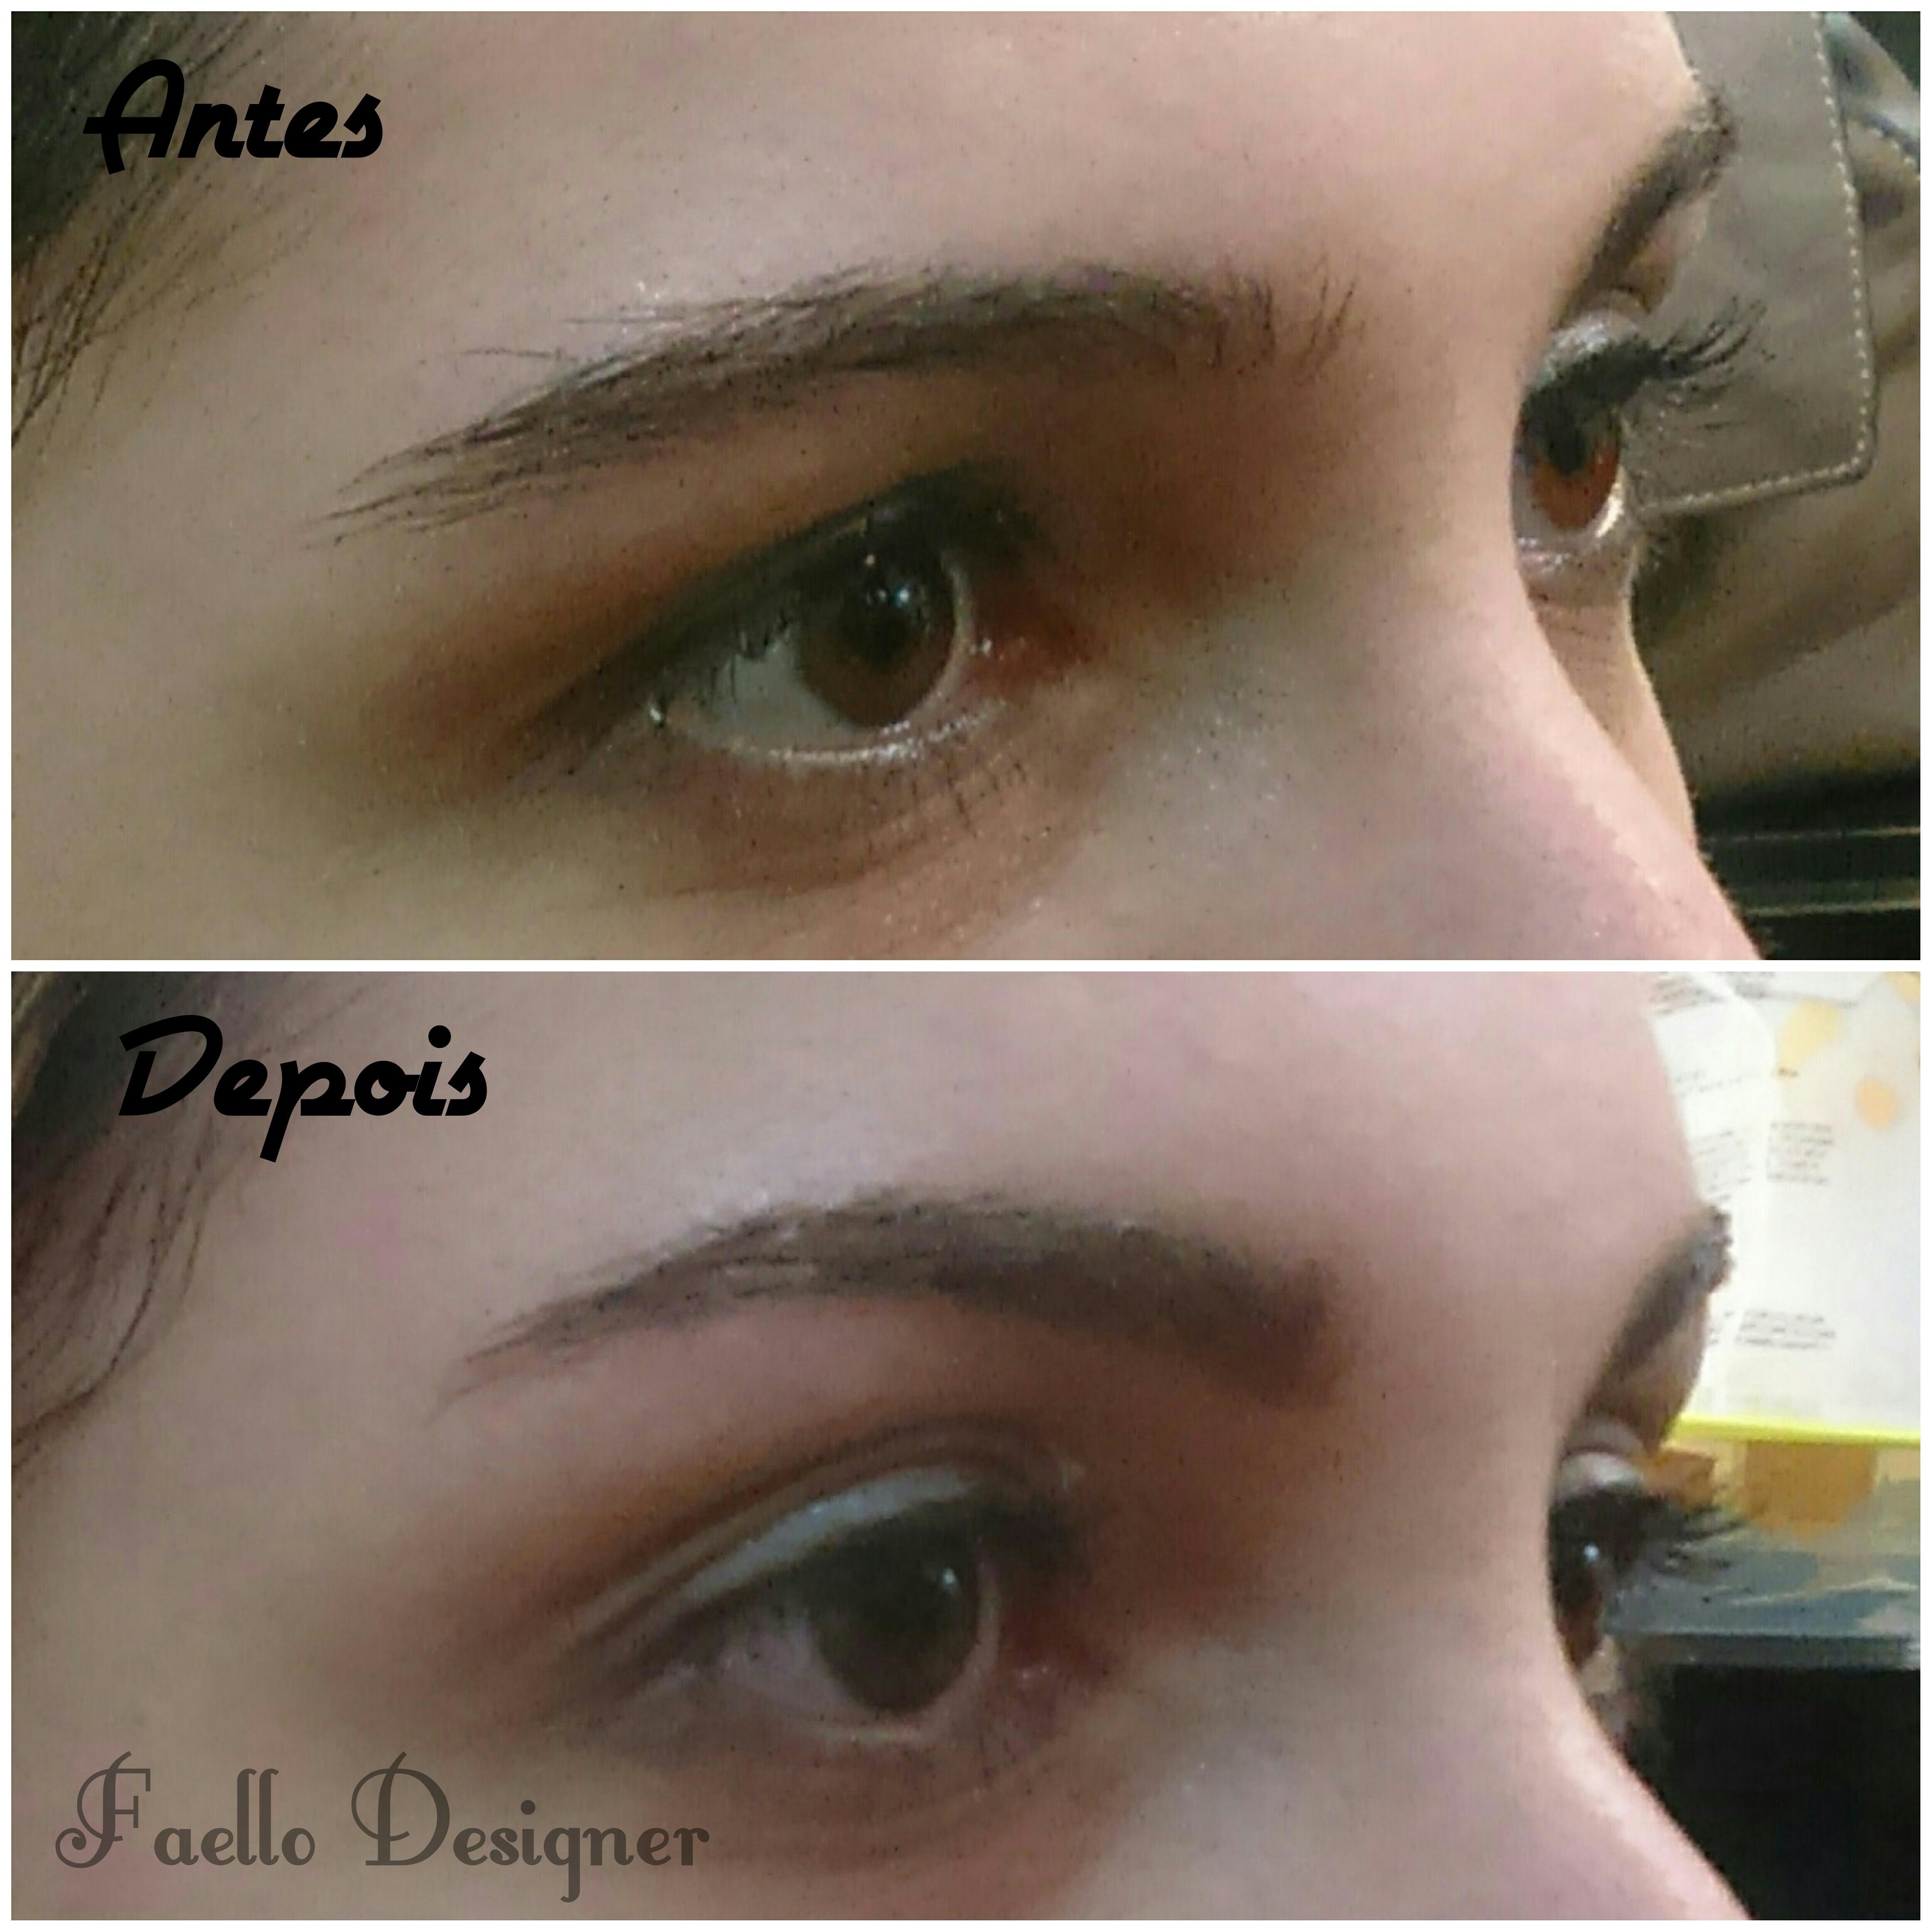 #sobrancelha #designerperfeito #olhardediva #faellodesigner micropigmentador(a) designer de sobrancelhas maquiador(a) dermopigmentador(a)